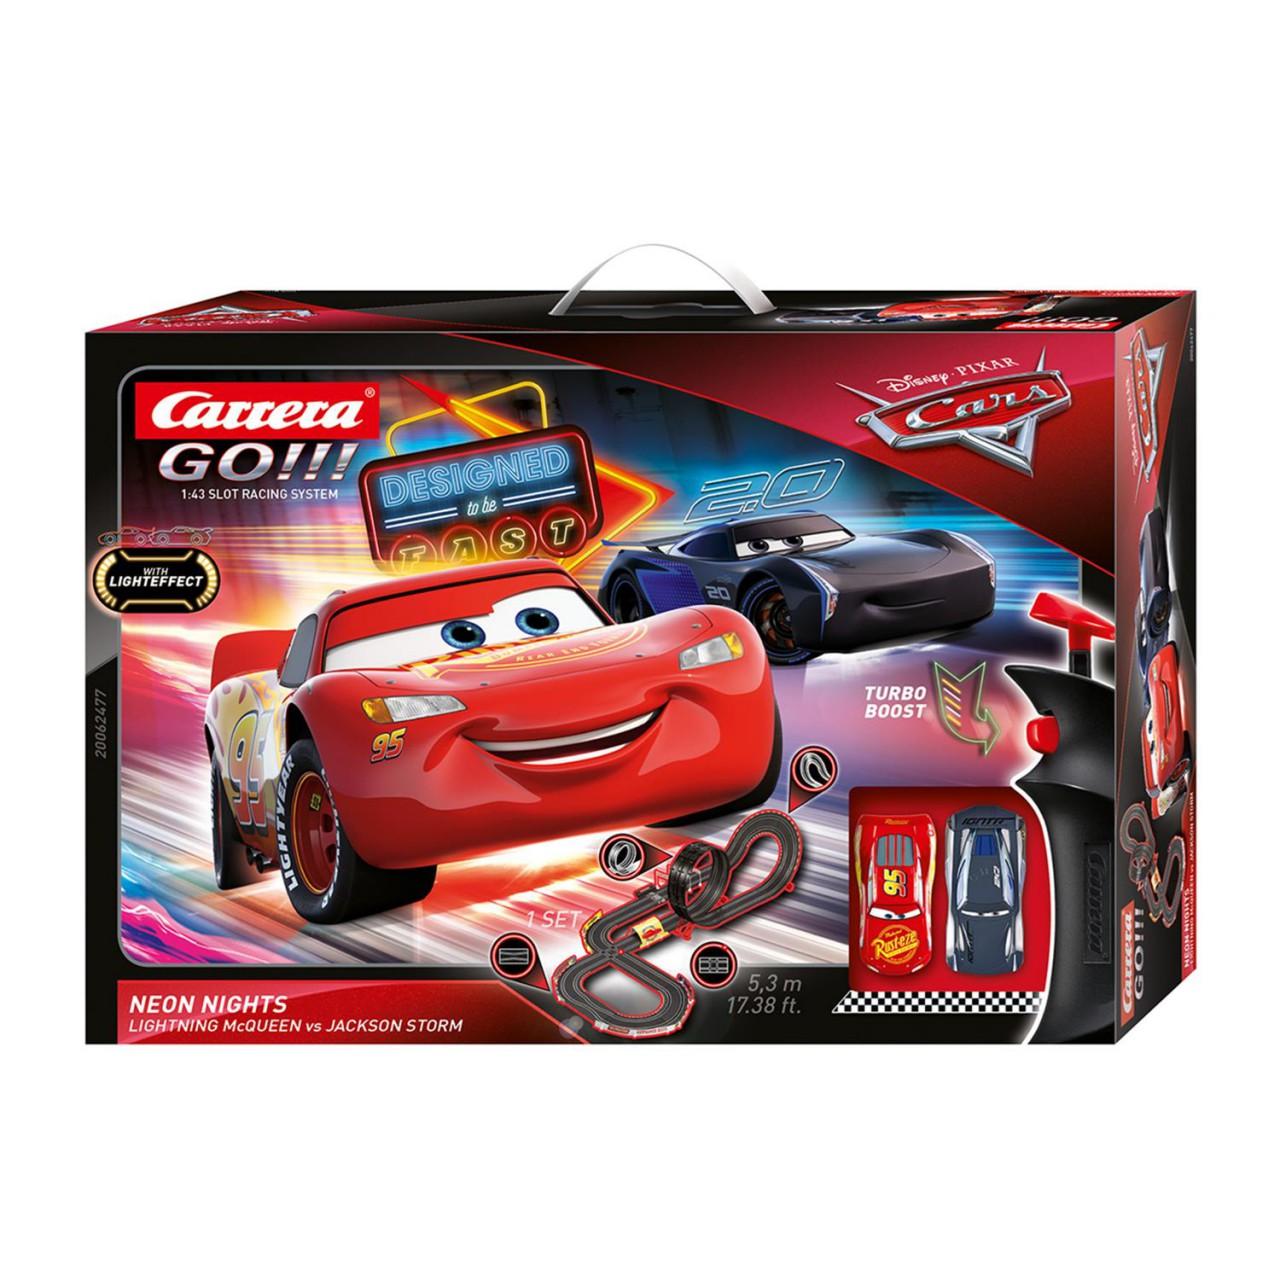 Carrera GO!!! 20062477 Disney-Pixar Cars - Neon Nights